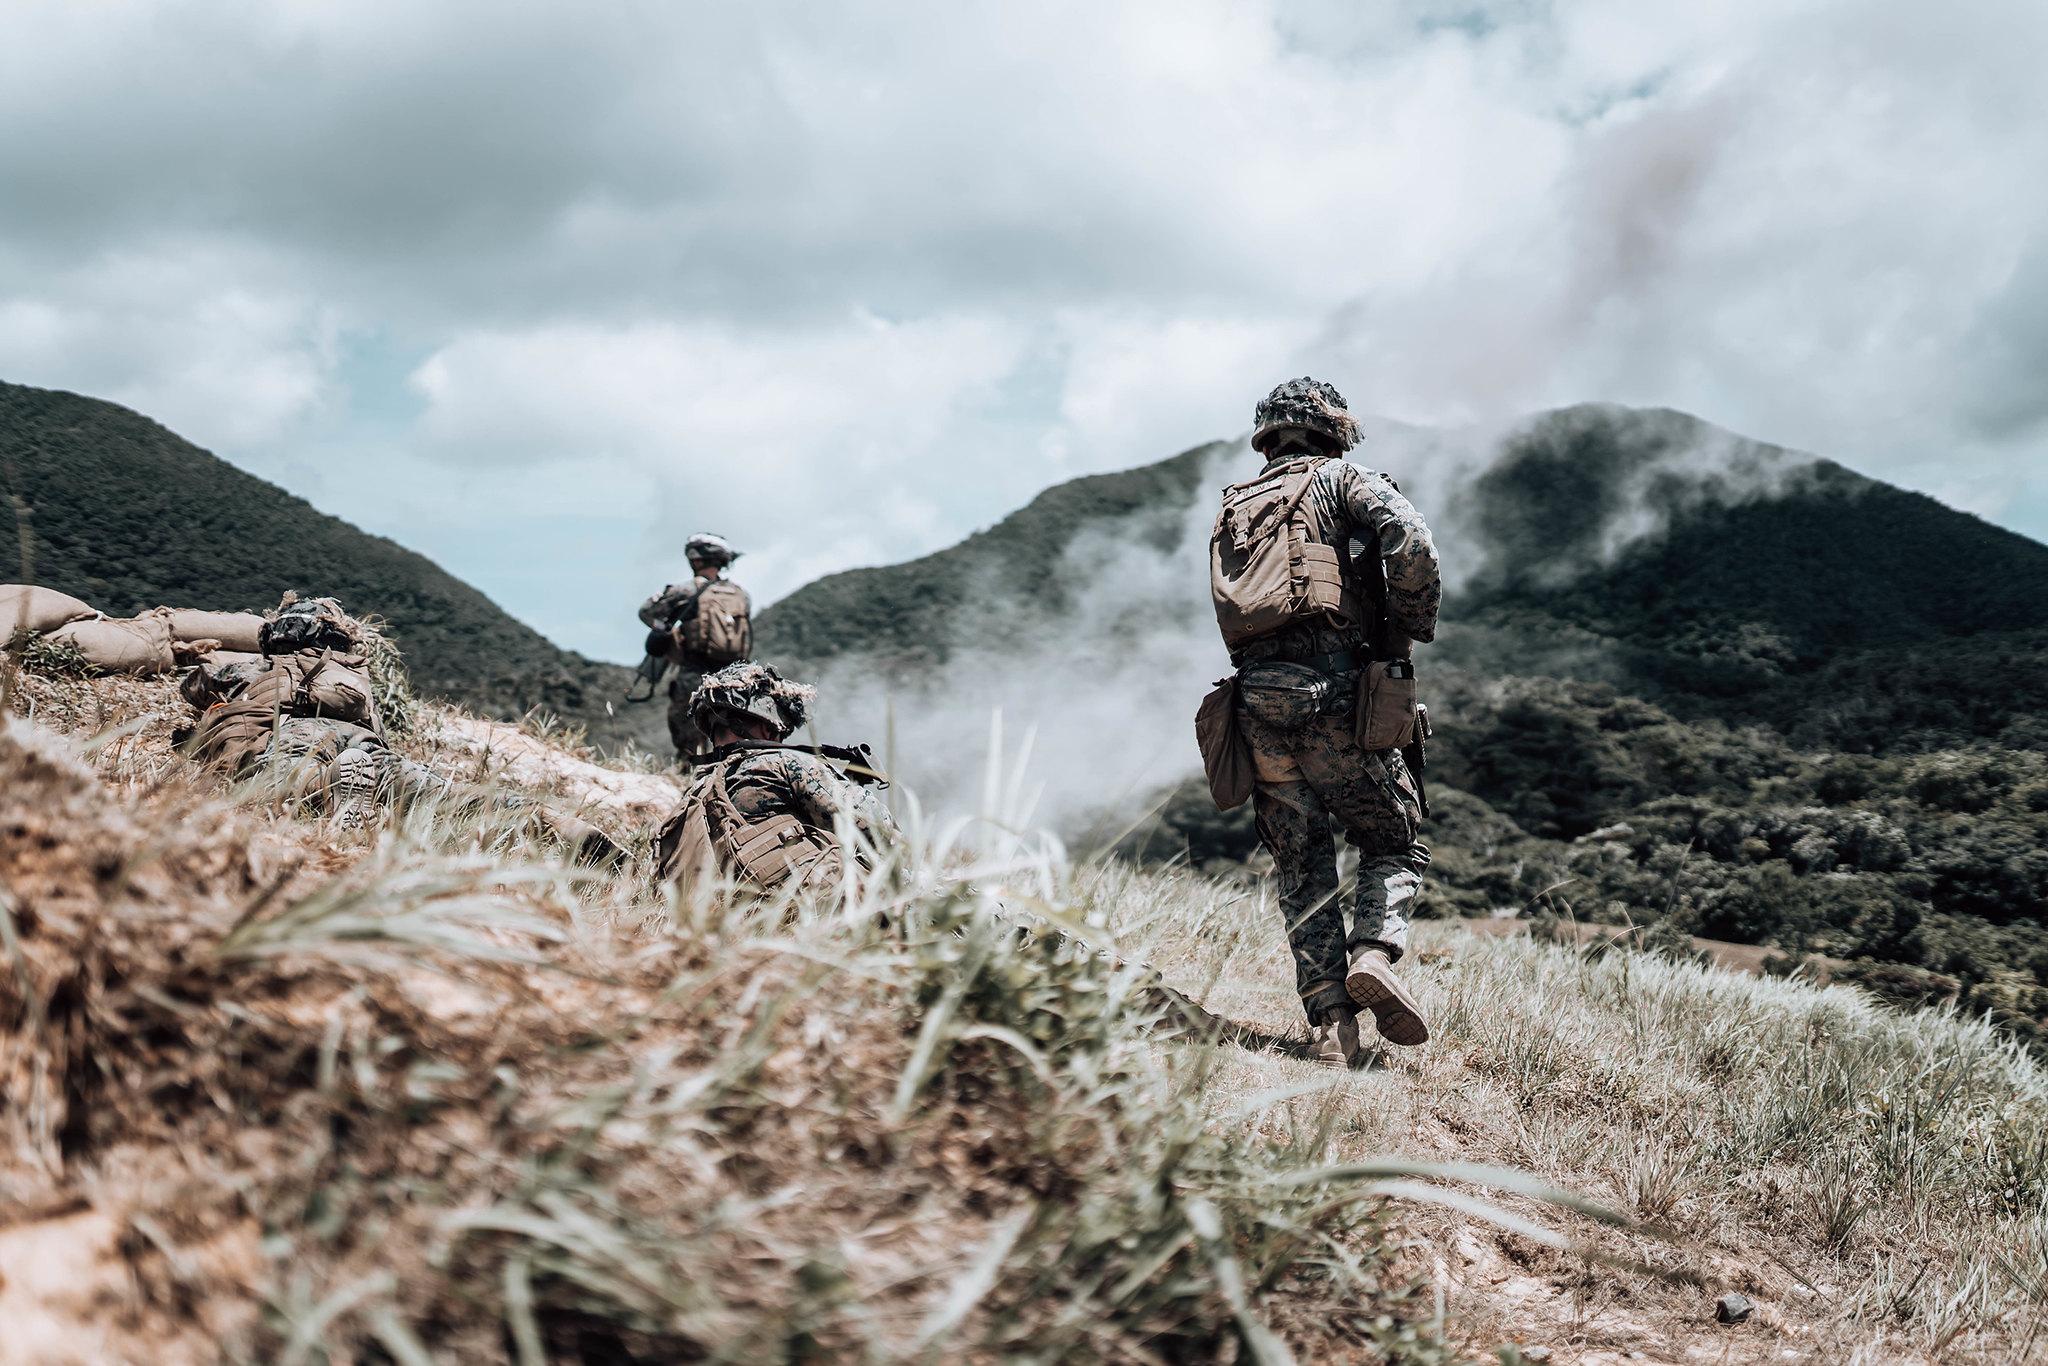 Marines conduct live-fire maneuver drills on June 18, 2020, on Camp Schwab, Okinawa, Japan. (Cpl. Josue Marquez/Marine Corps)